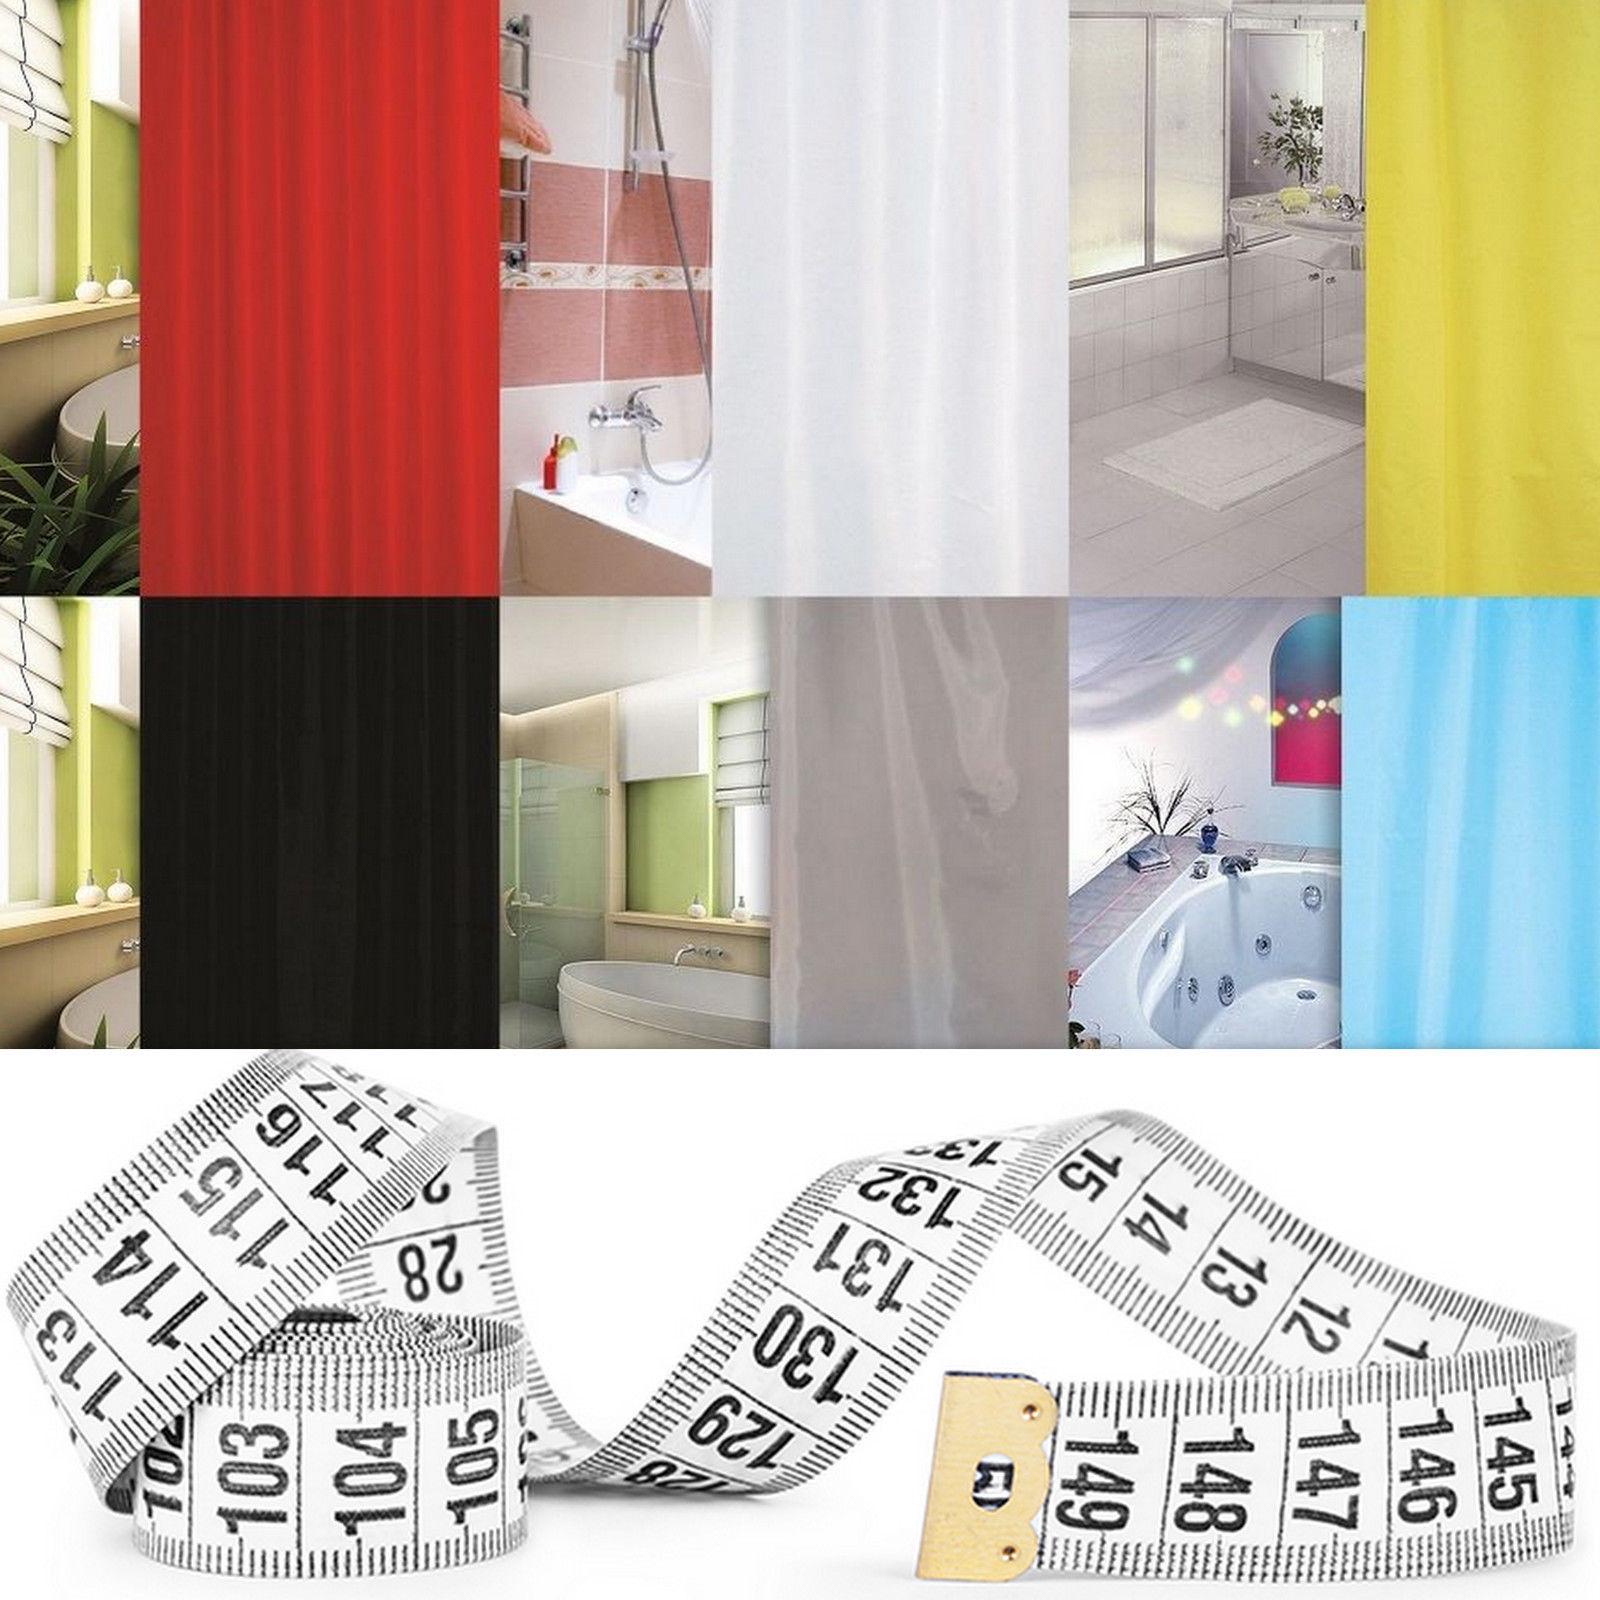 Duschvorhang 240x200 textil duschvorhang 240x200 cm blau rot schwarz grau braun grün duschabtrennung ebay